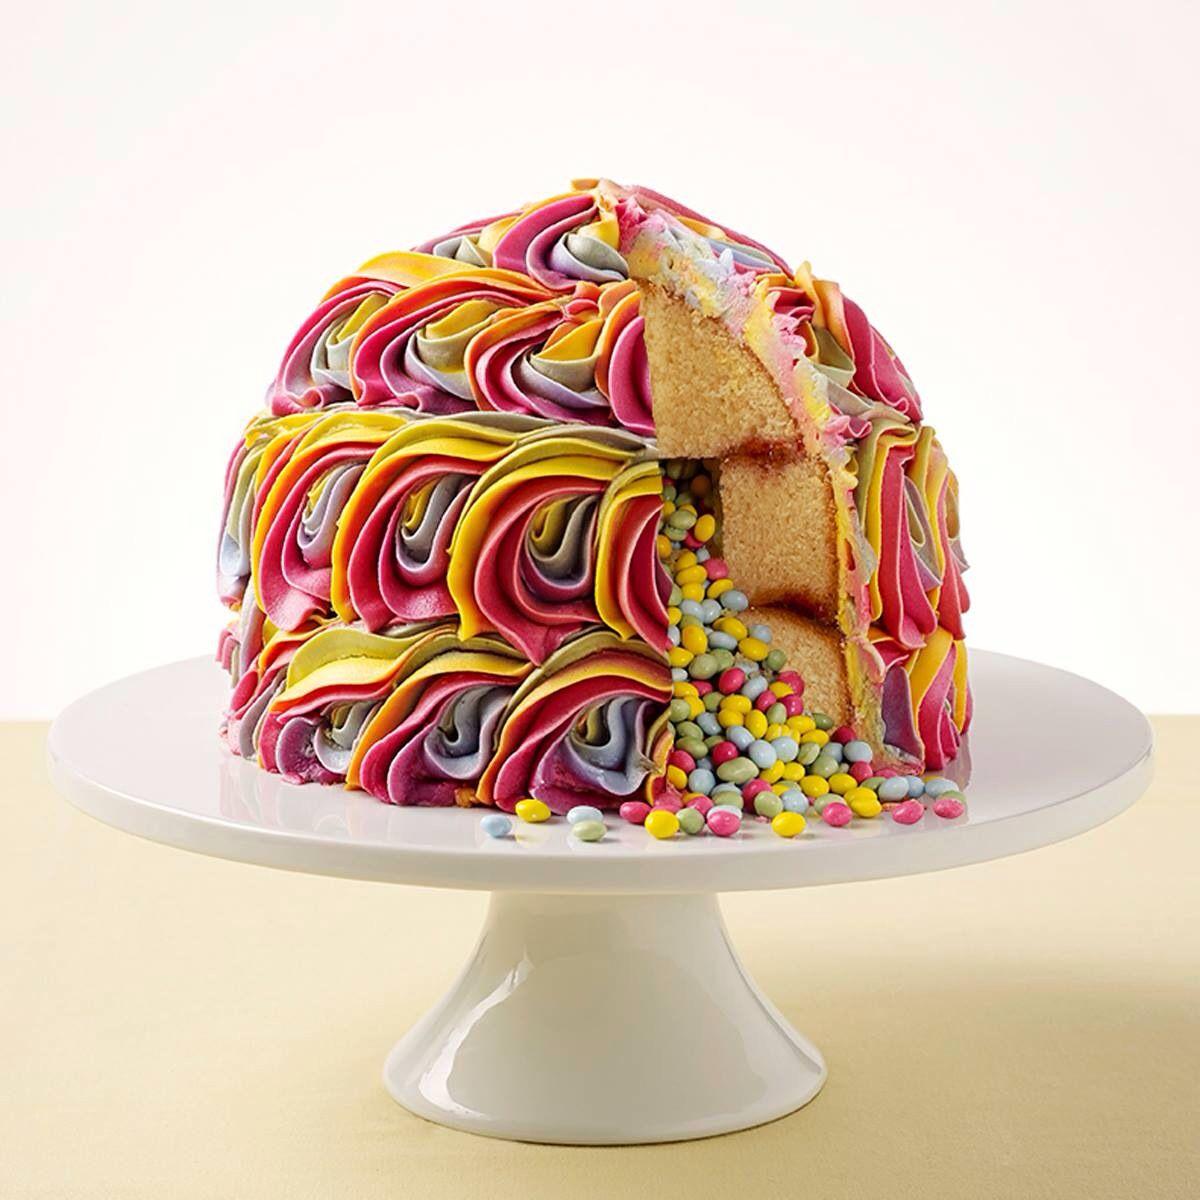 Asda piata cake 10 a bargain httpmoceriesda cake asda piata sciox Images